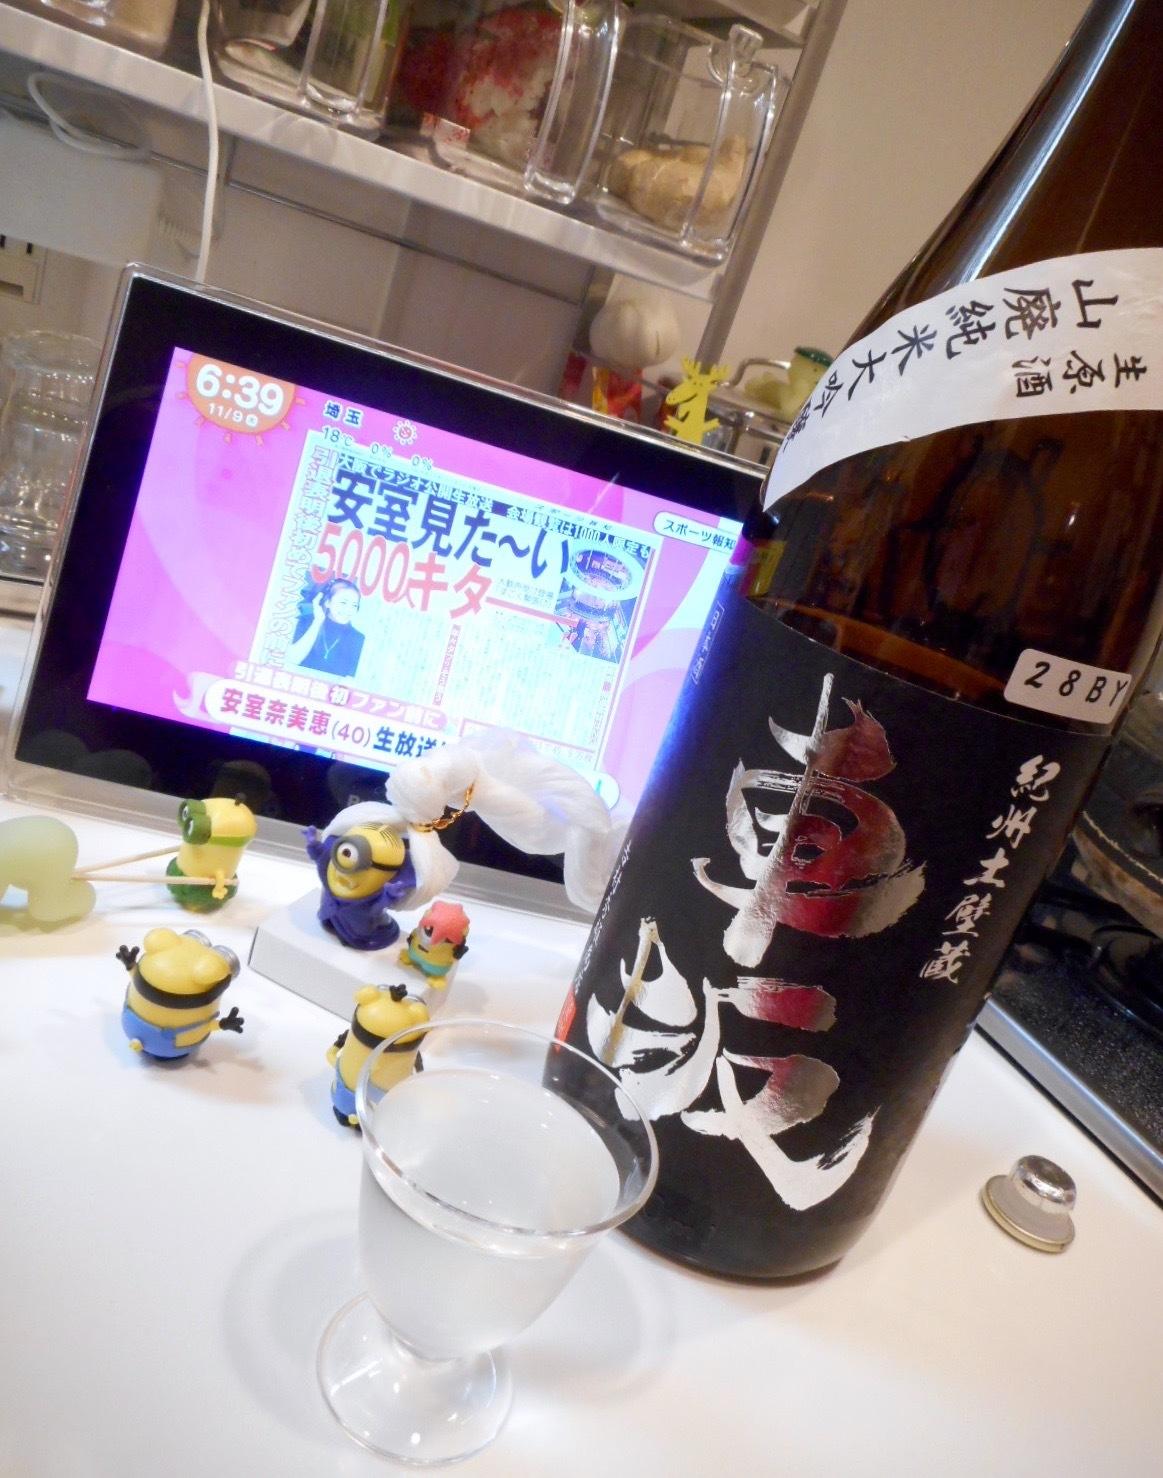 kurumazaka_yamahai_jundai28by8.jpg